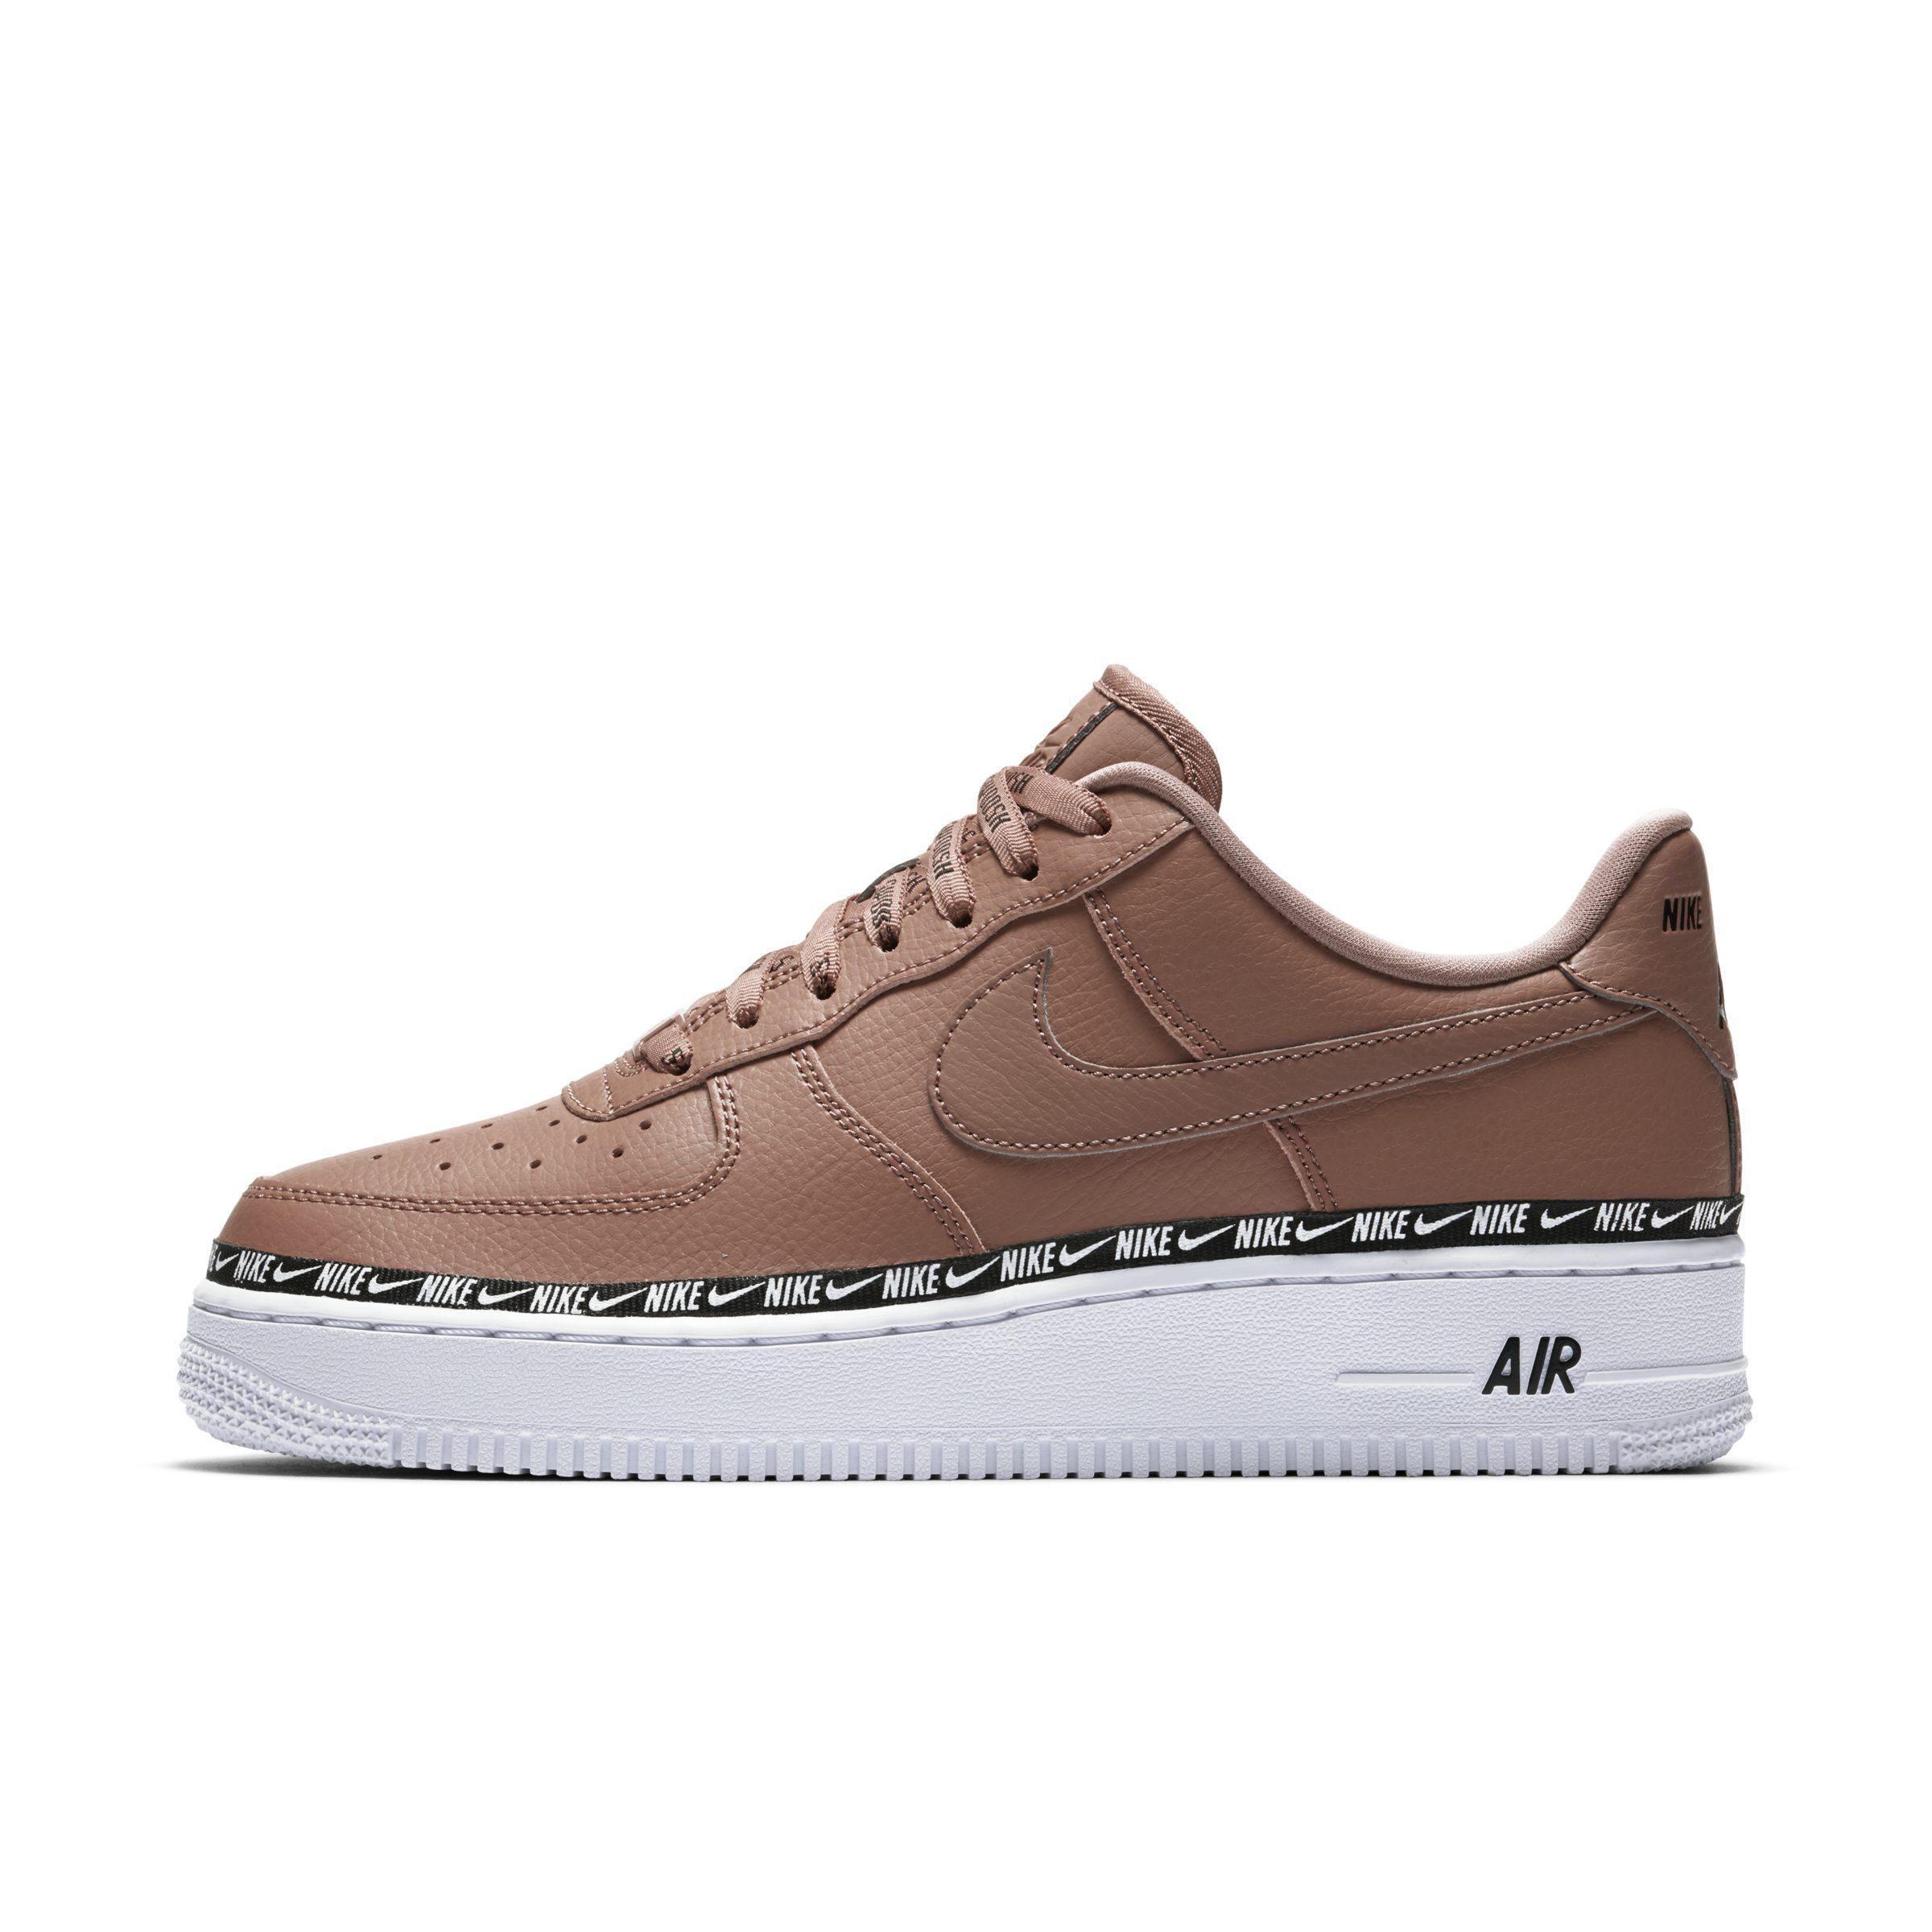 0b53293836 Nike Air Force 1' 07 Se Premium Shoe in Brown - Lyst